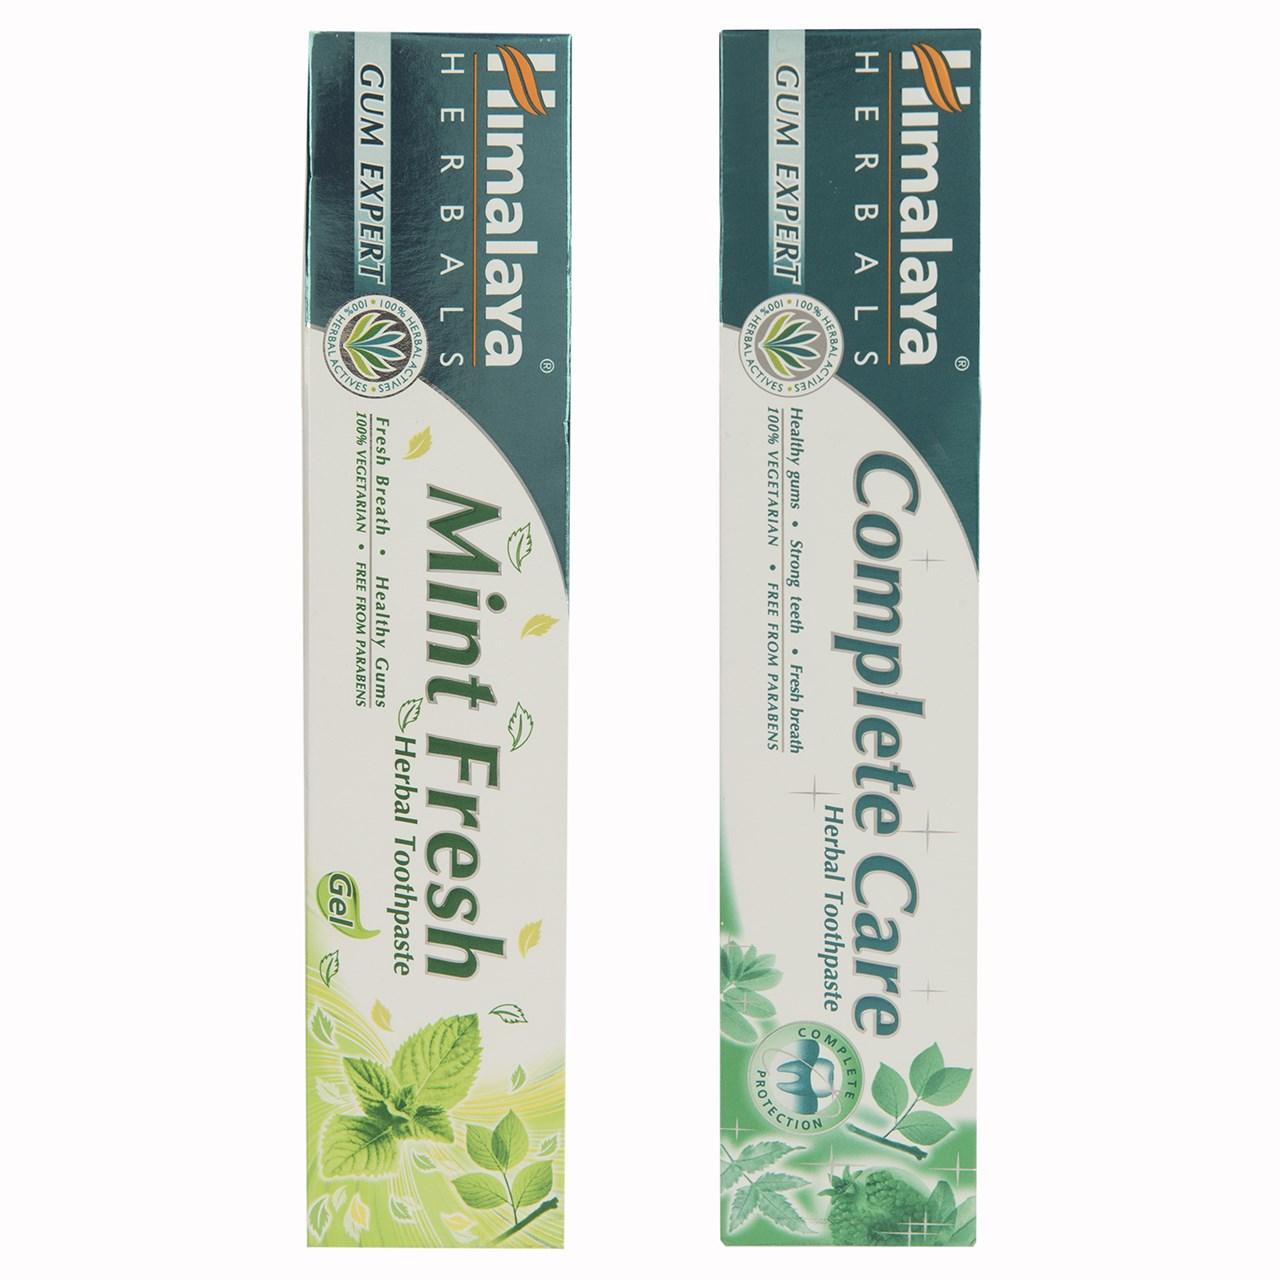 خرید                      ست خمیر دندان گیاهی هیمالیا مدل  Complete Care و Mint Fresh حجم 75 میلی لیتر